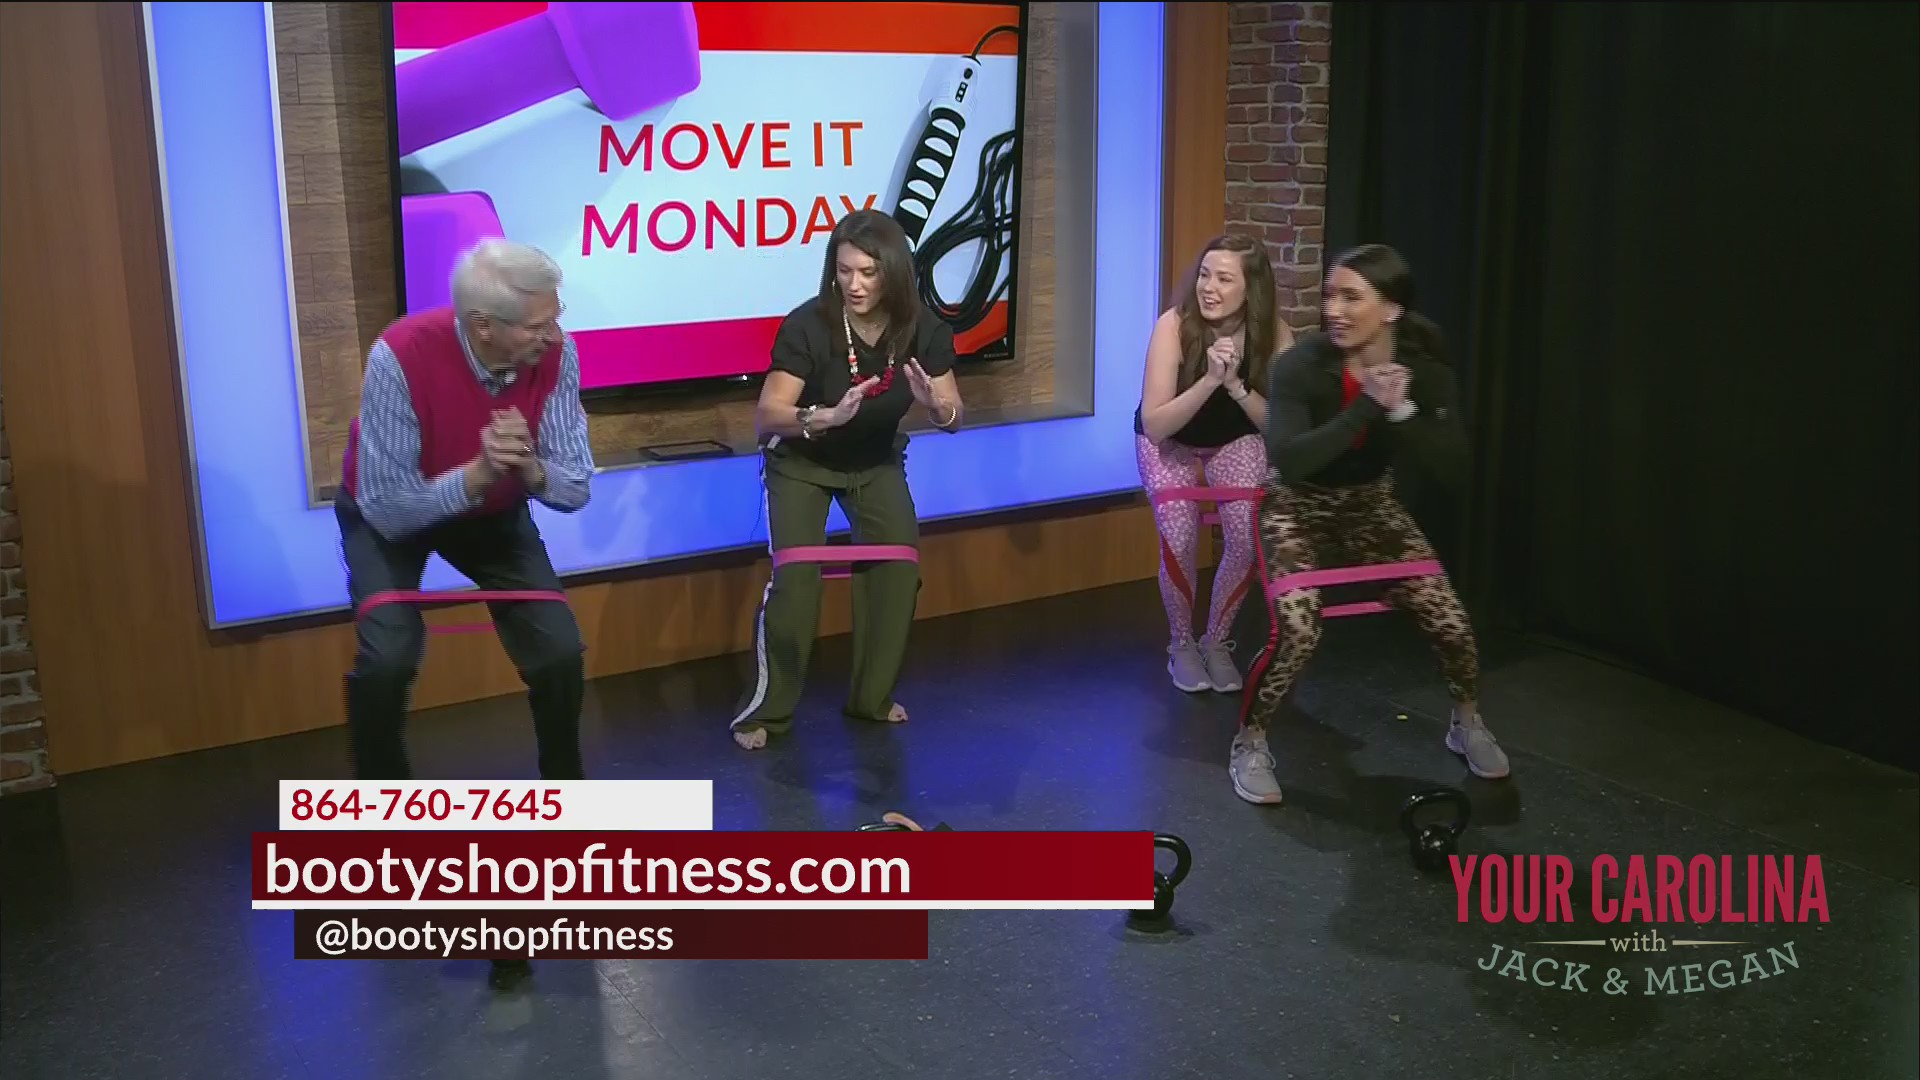 Move It Monday - Booty Shop